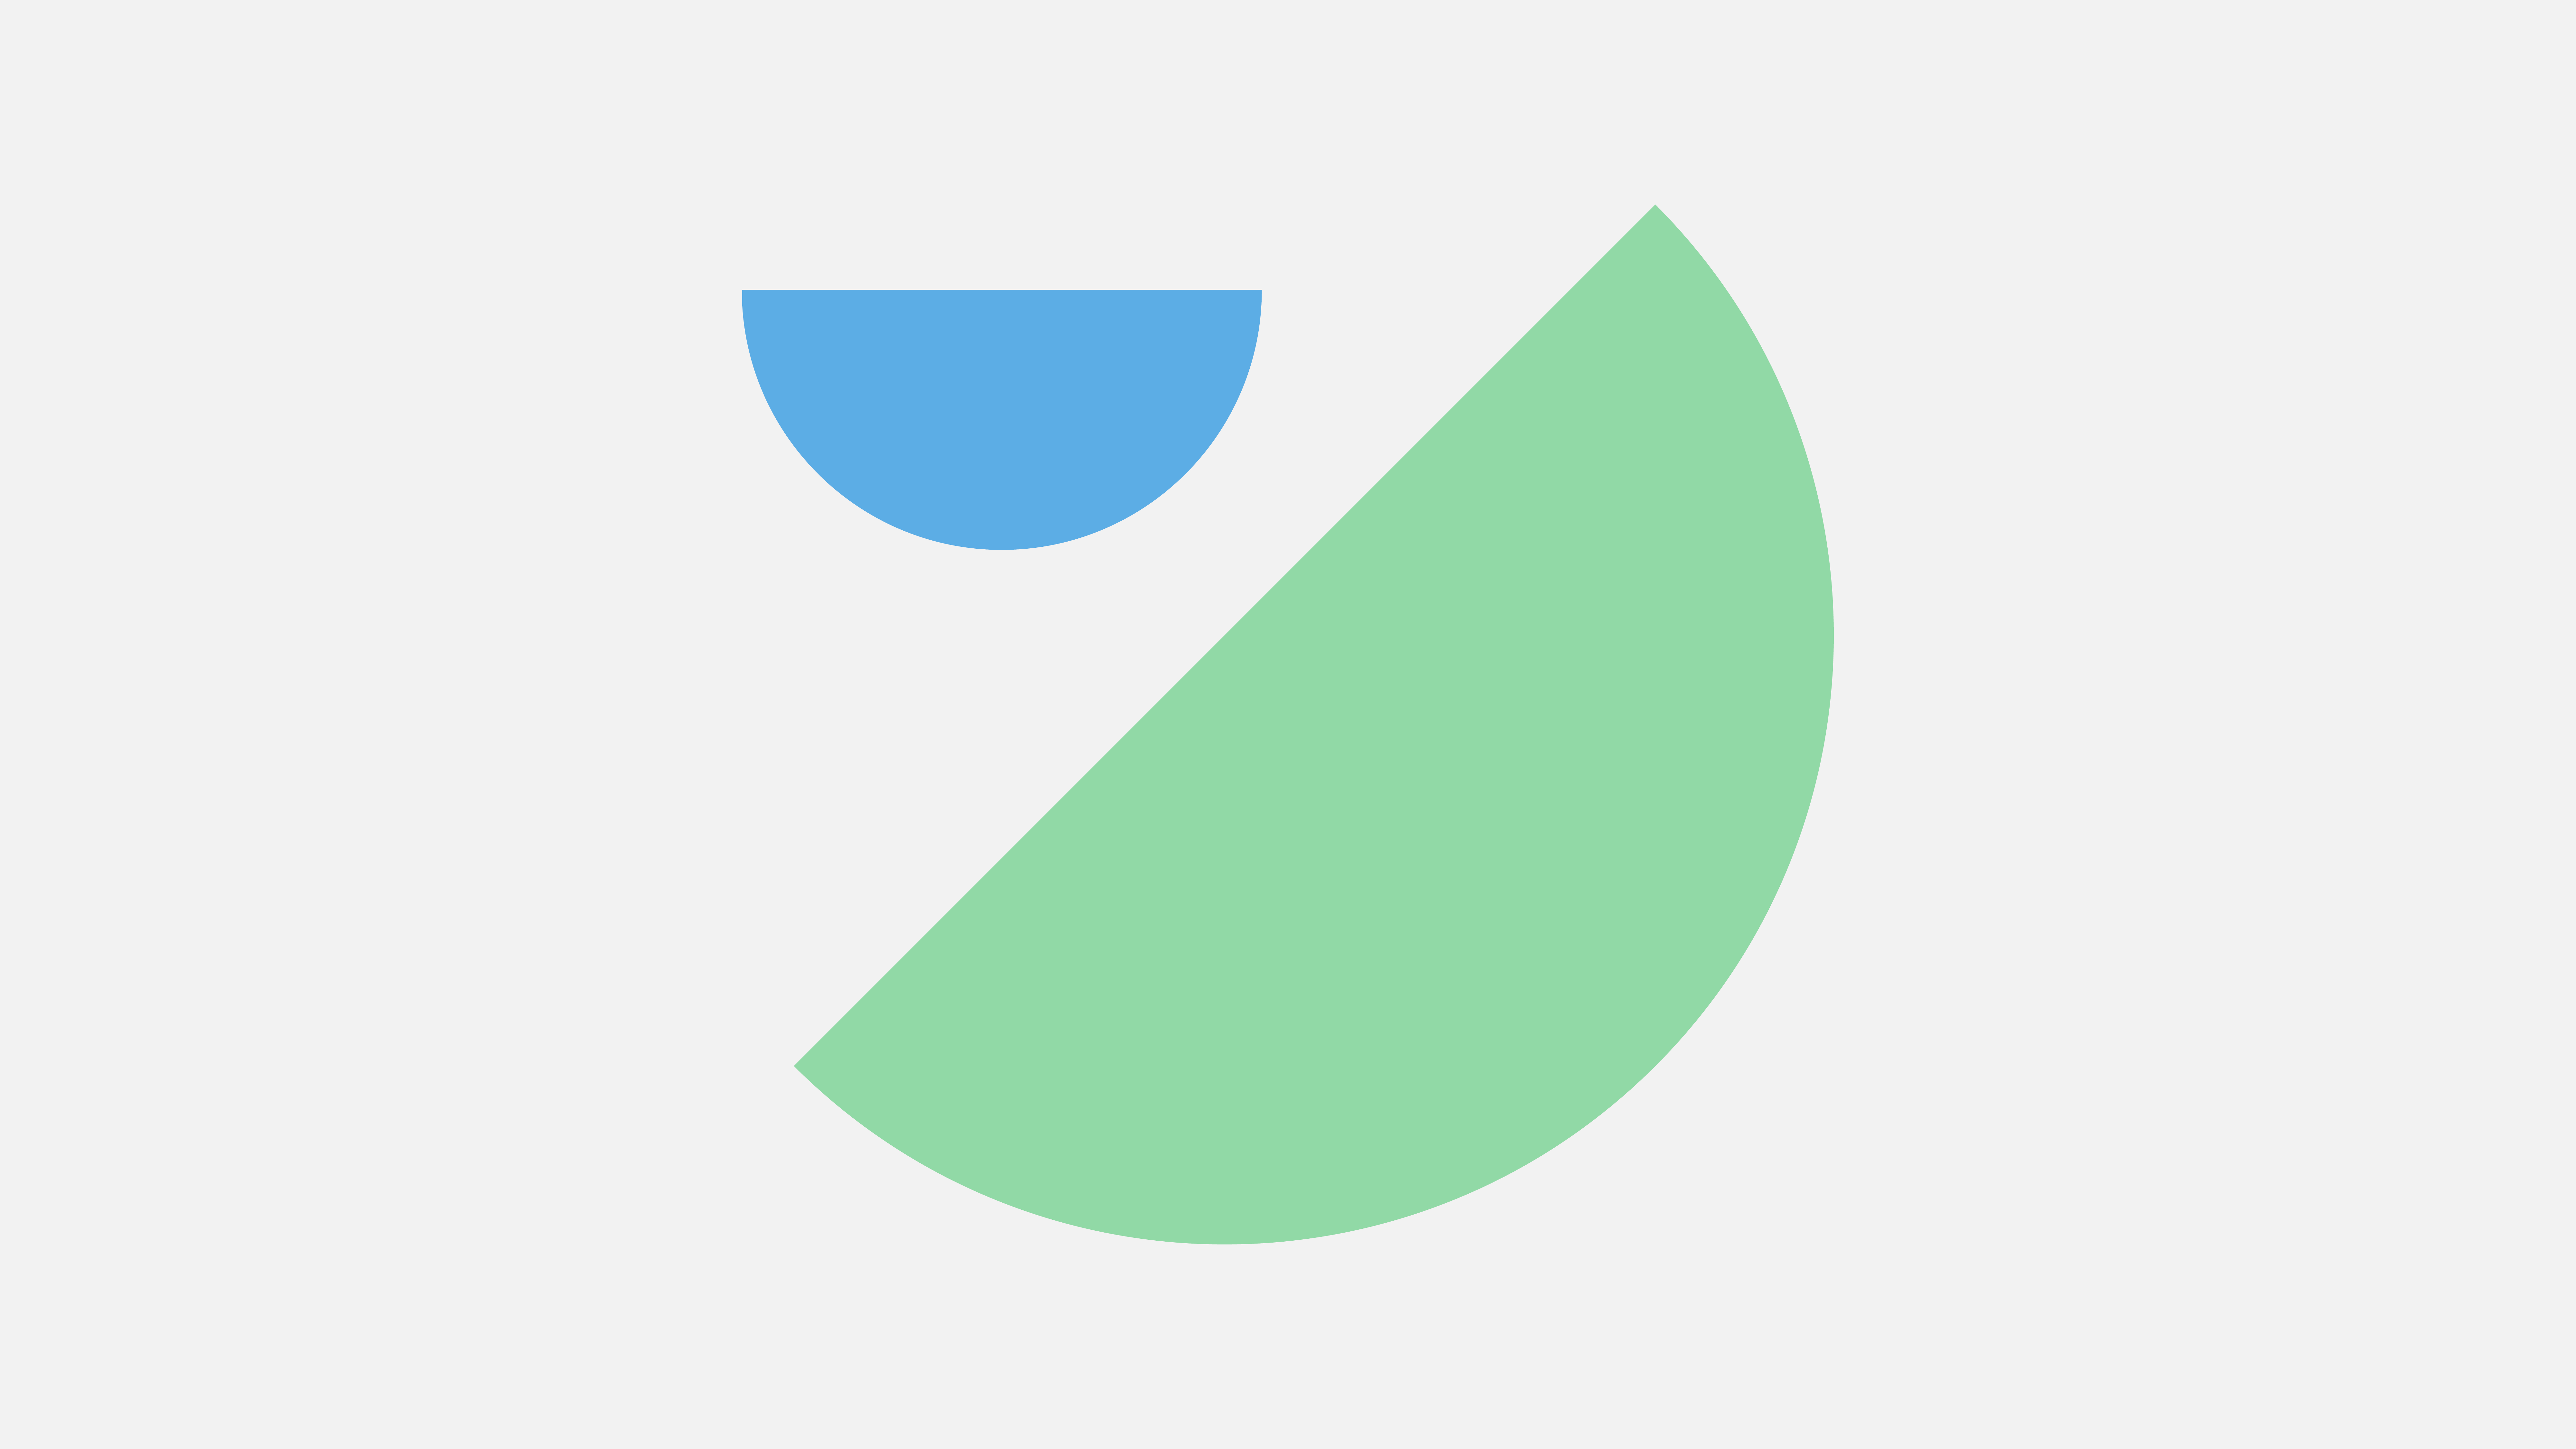 TessHeinricks_Block_Shapes_1